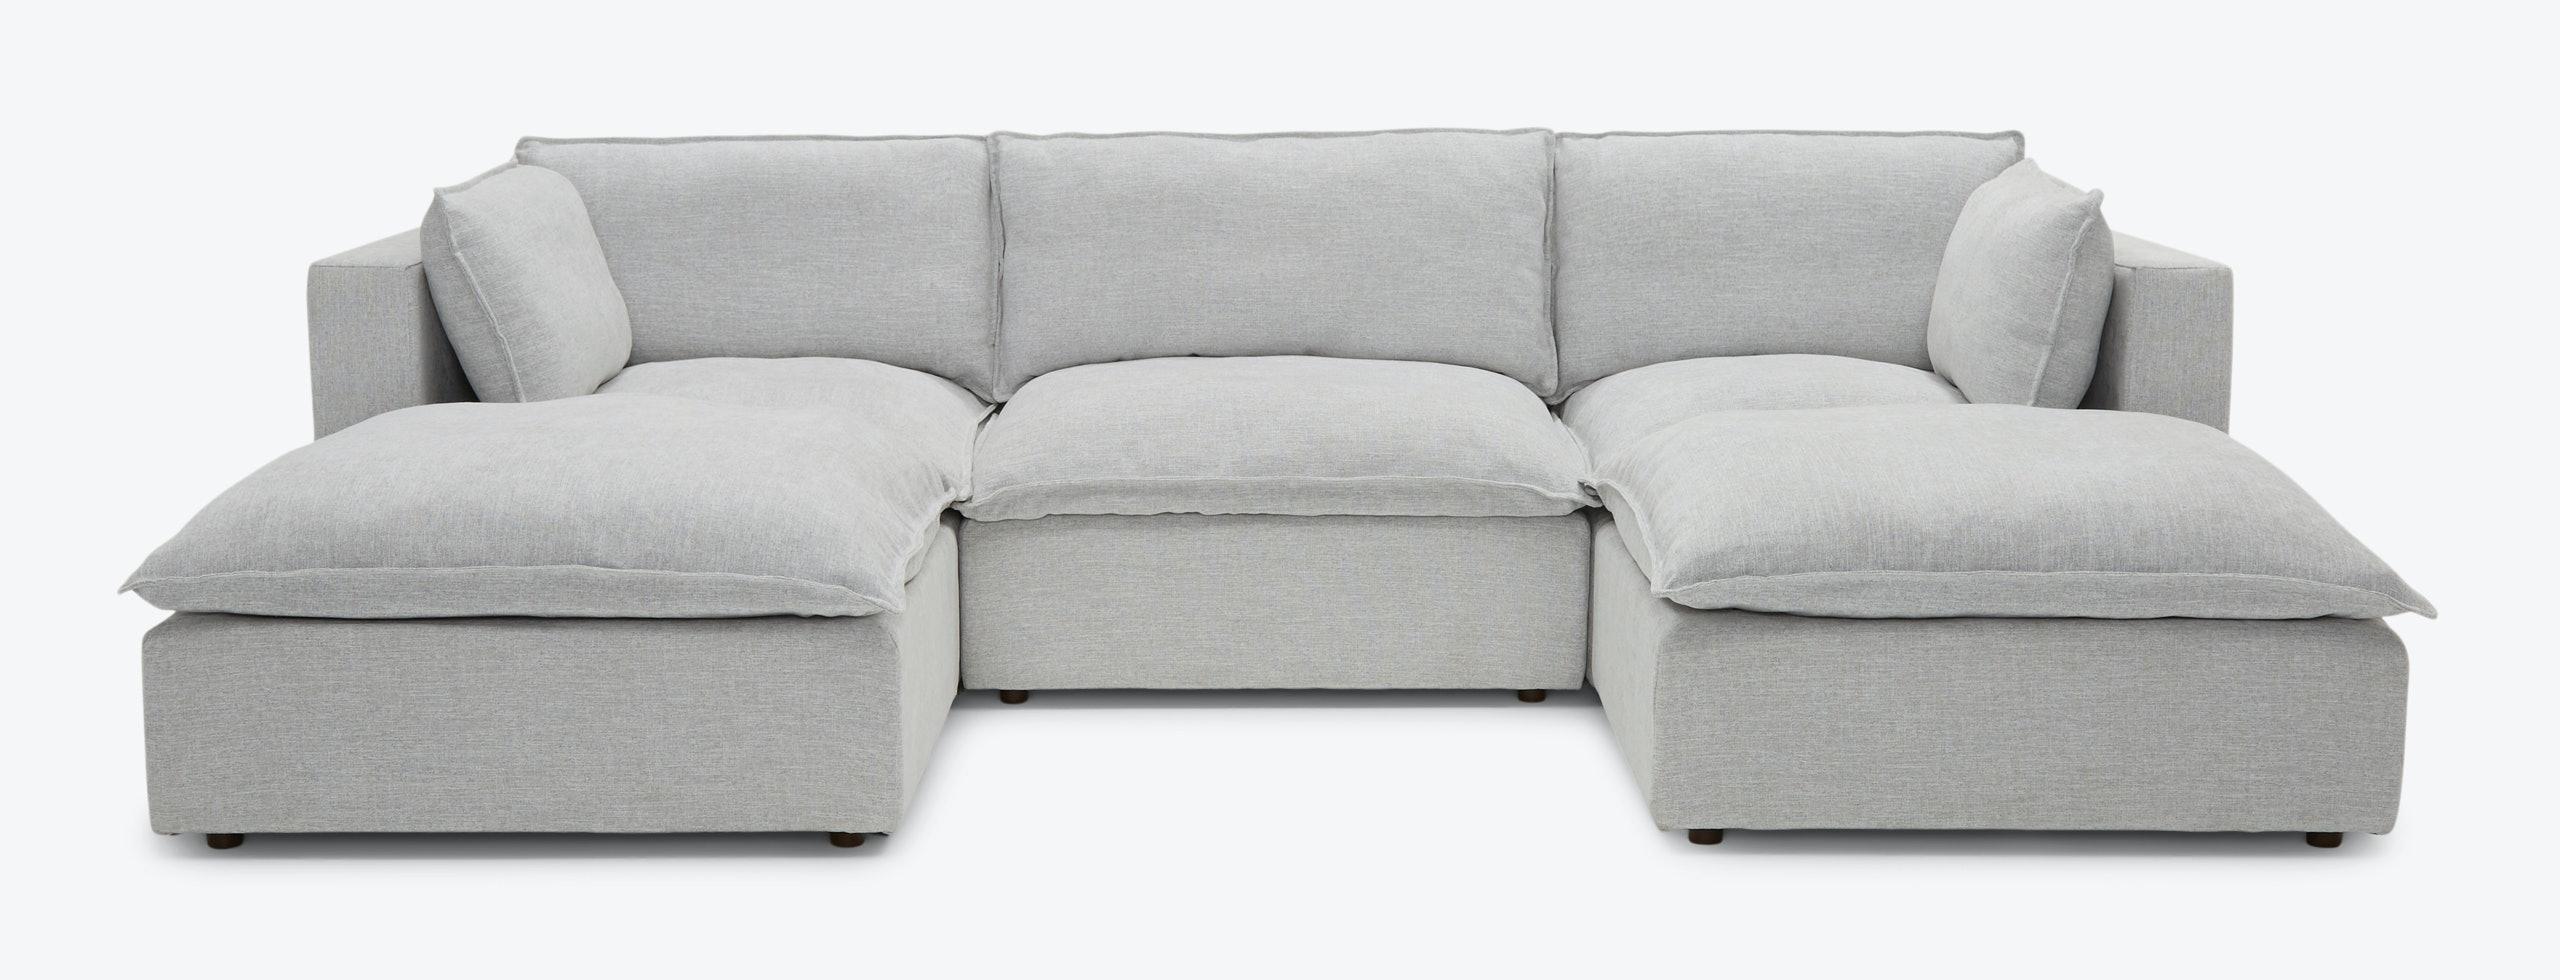 Haine Modular Chaise Sectional Milo Dove